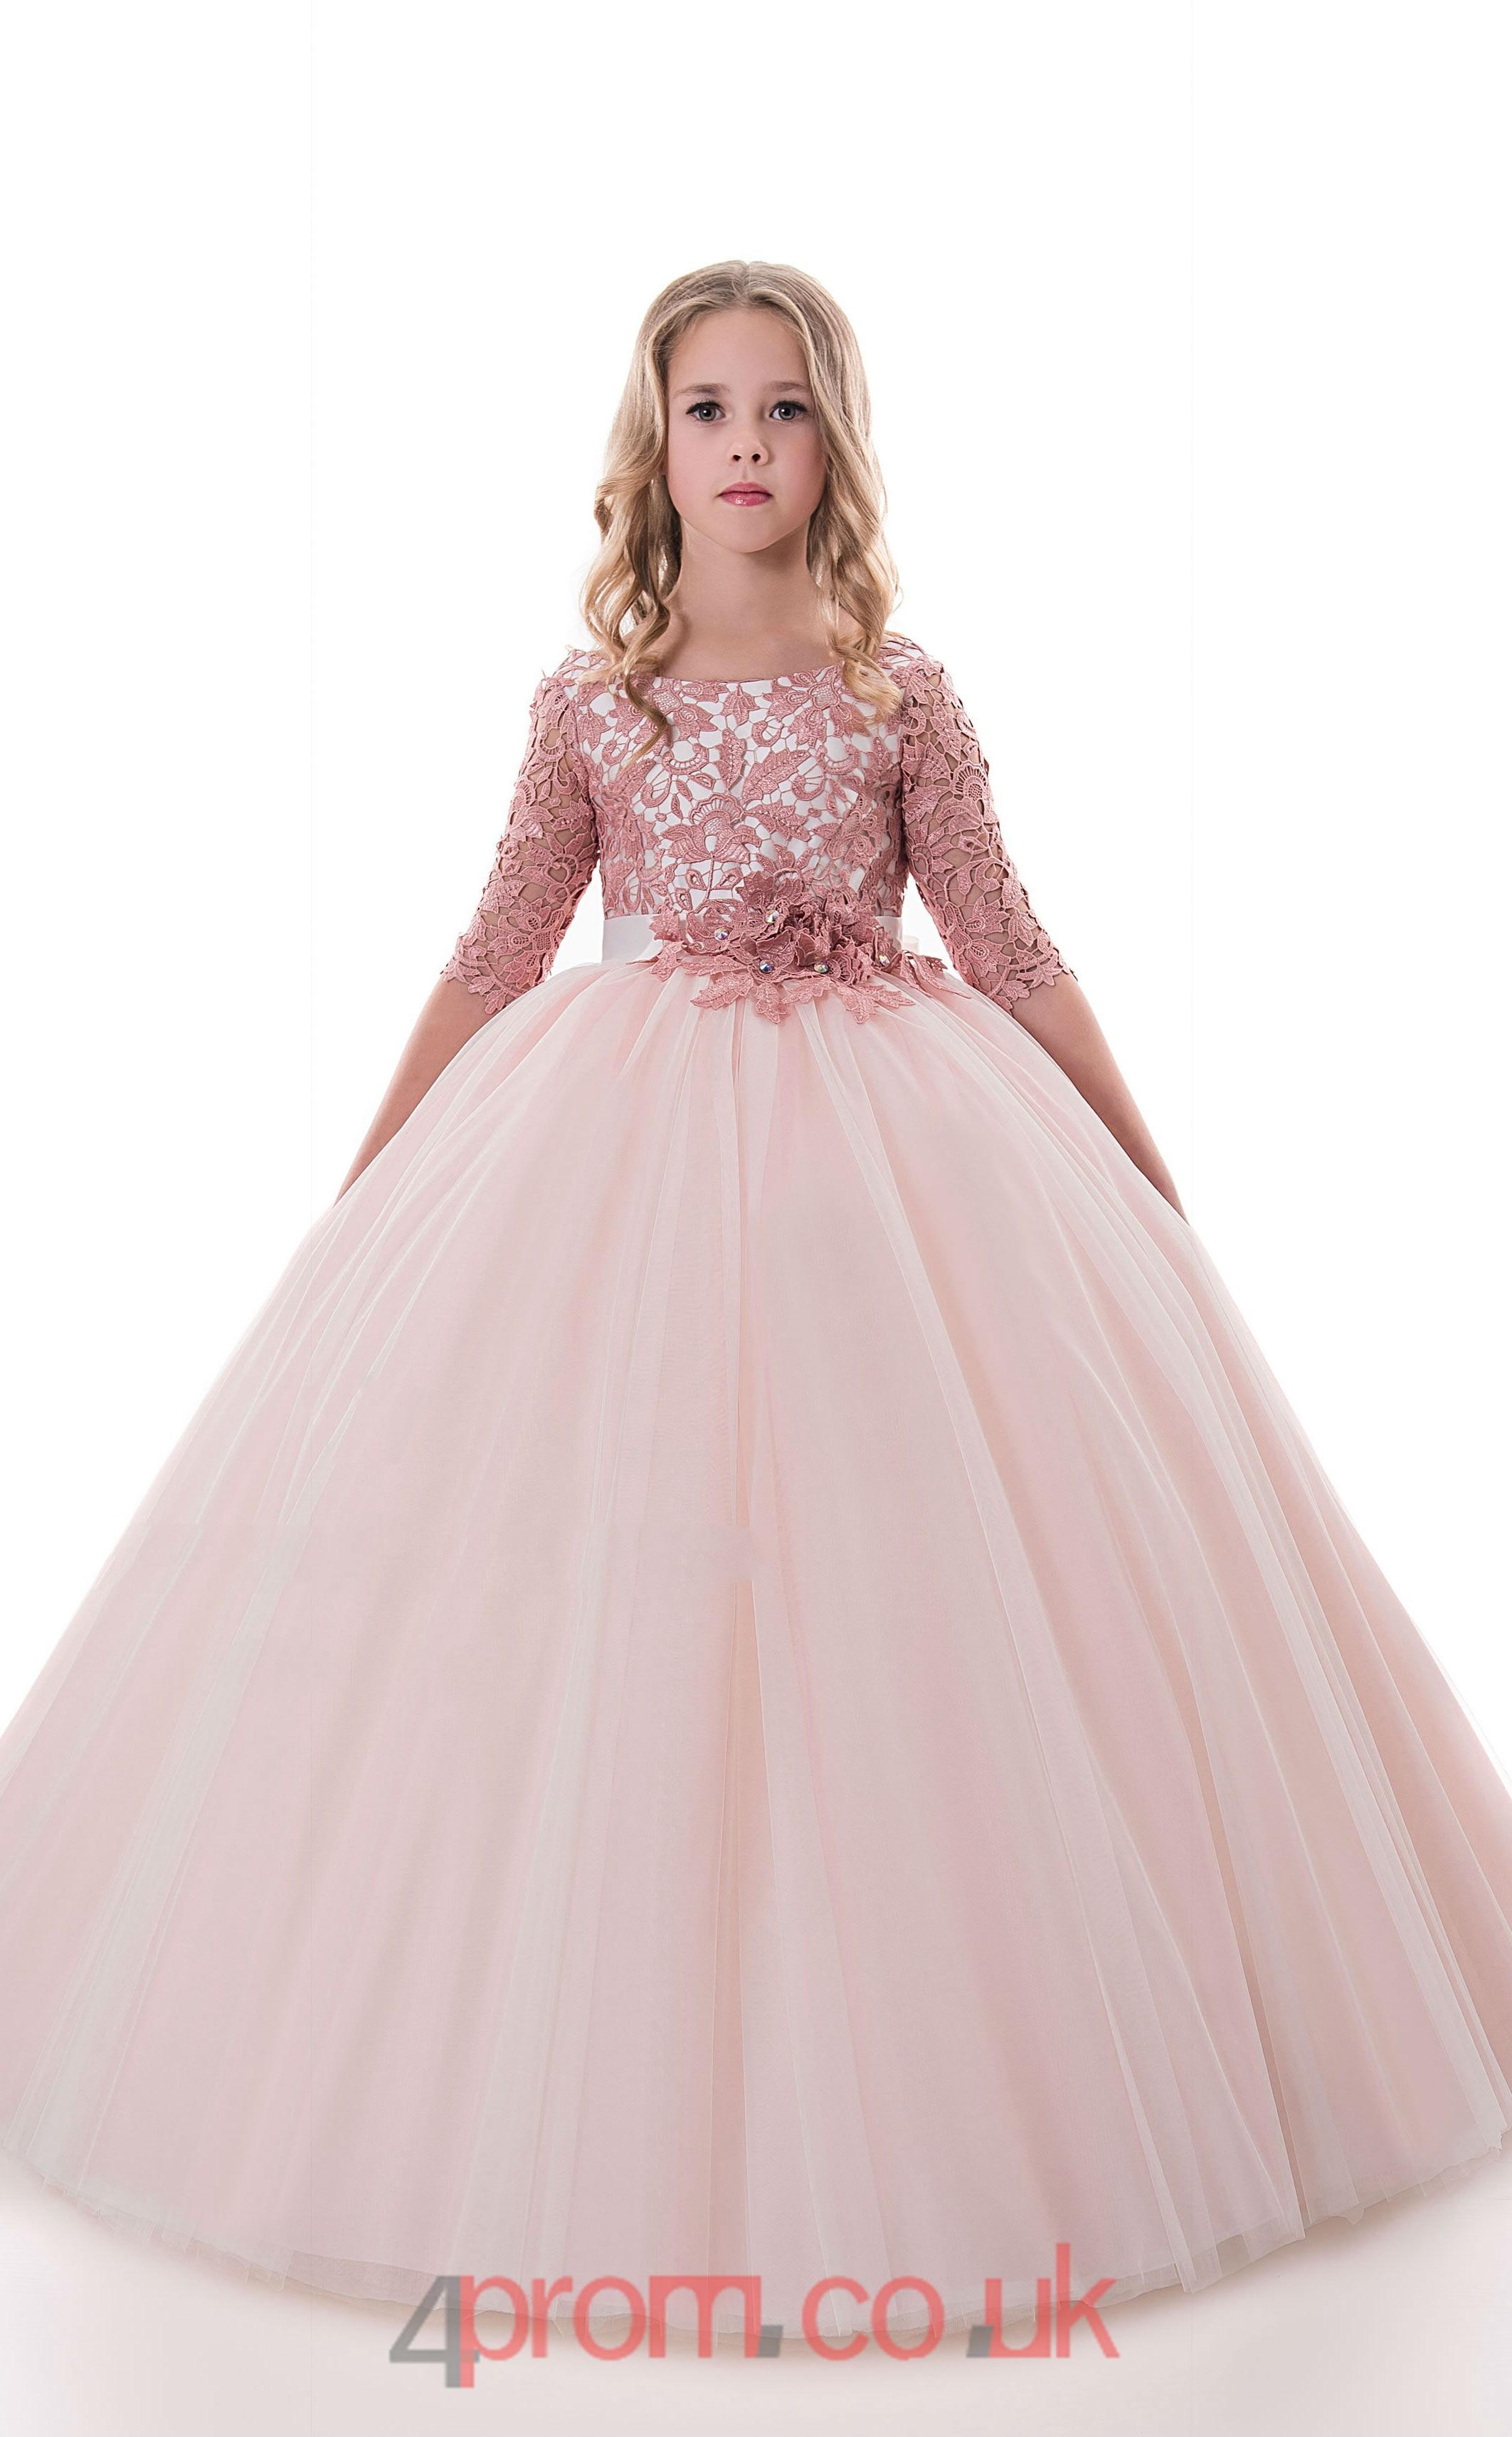 Jewel Half Sleeve Chic Kids Prom Dresses Chk011 4prom Co Uk